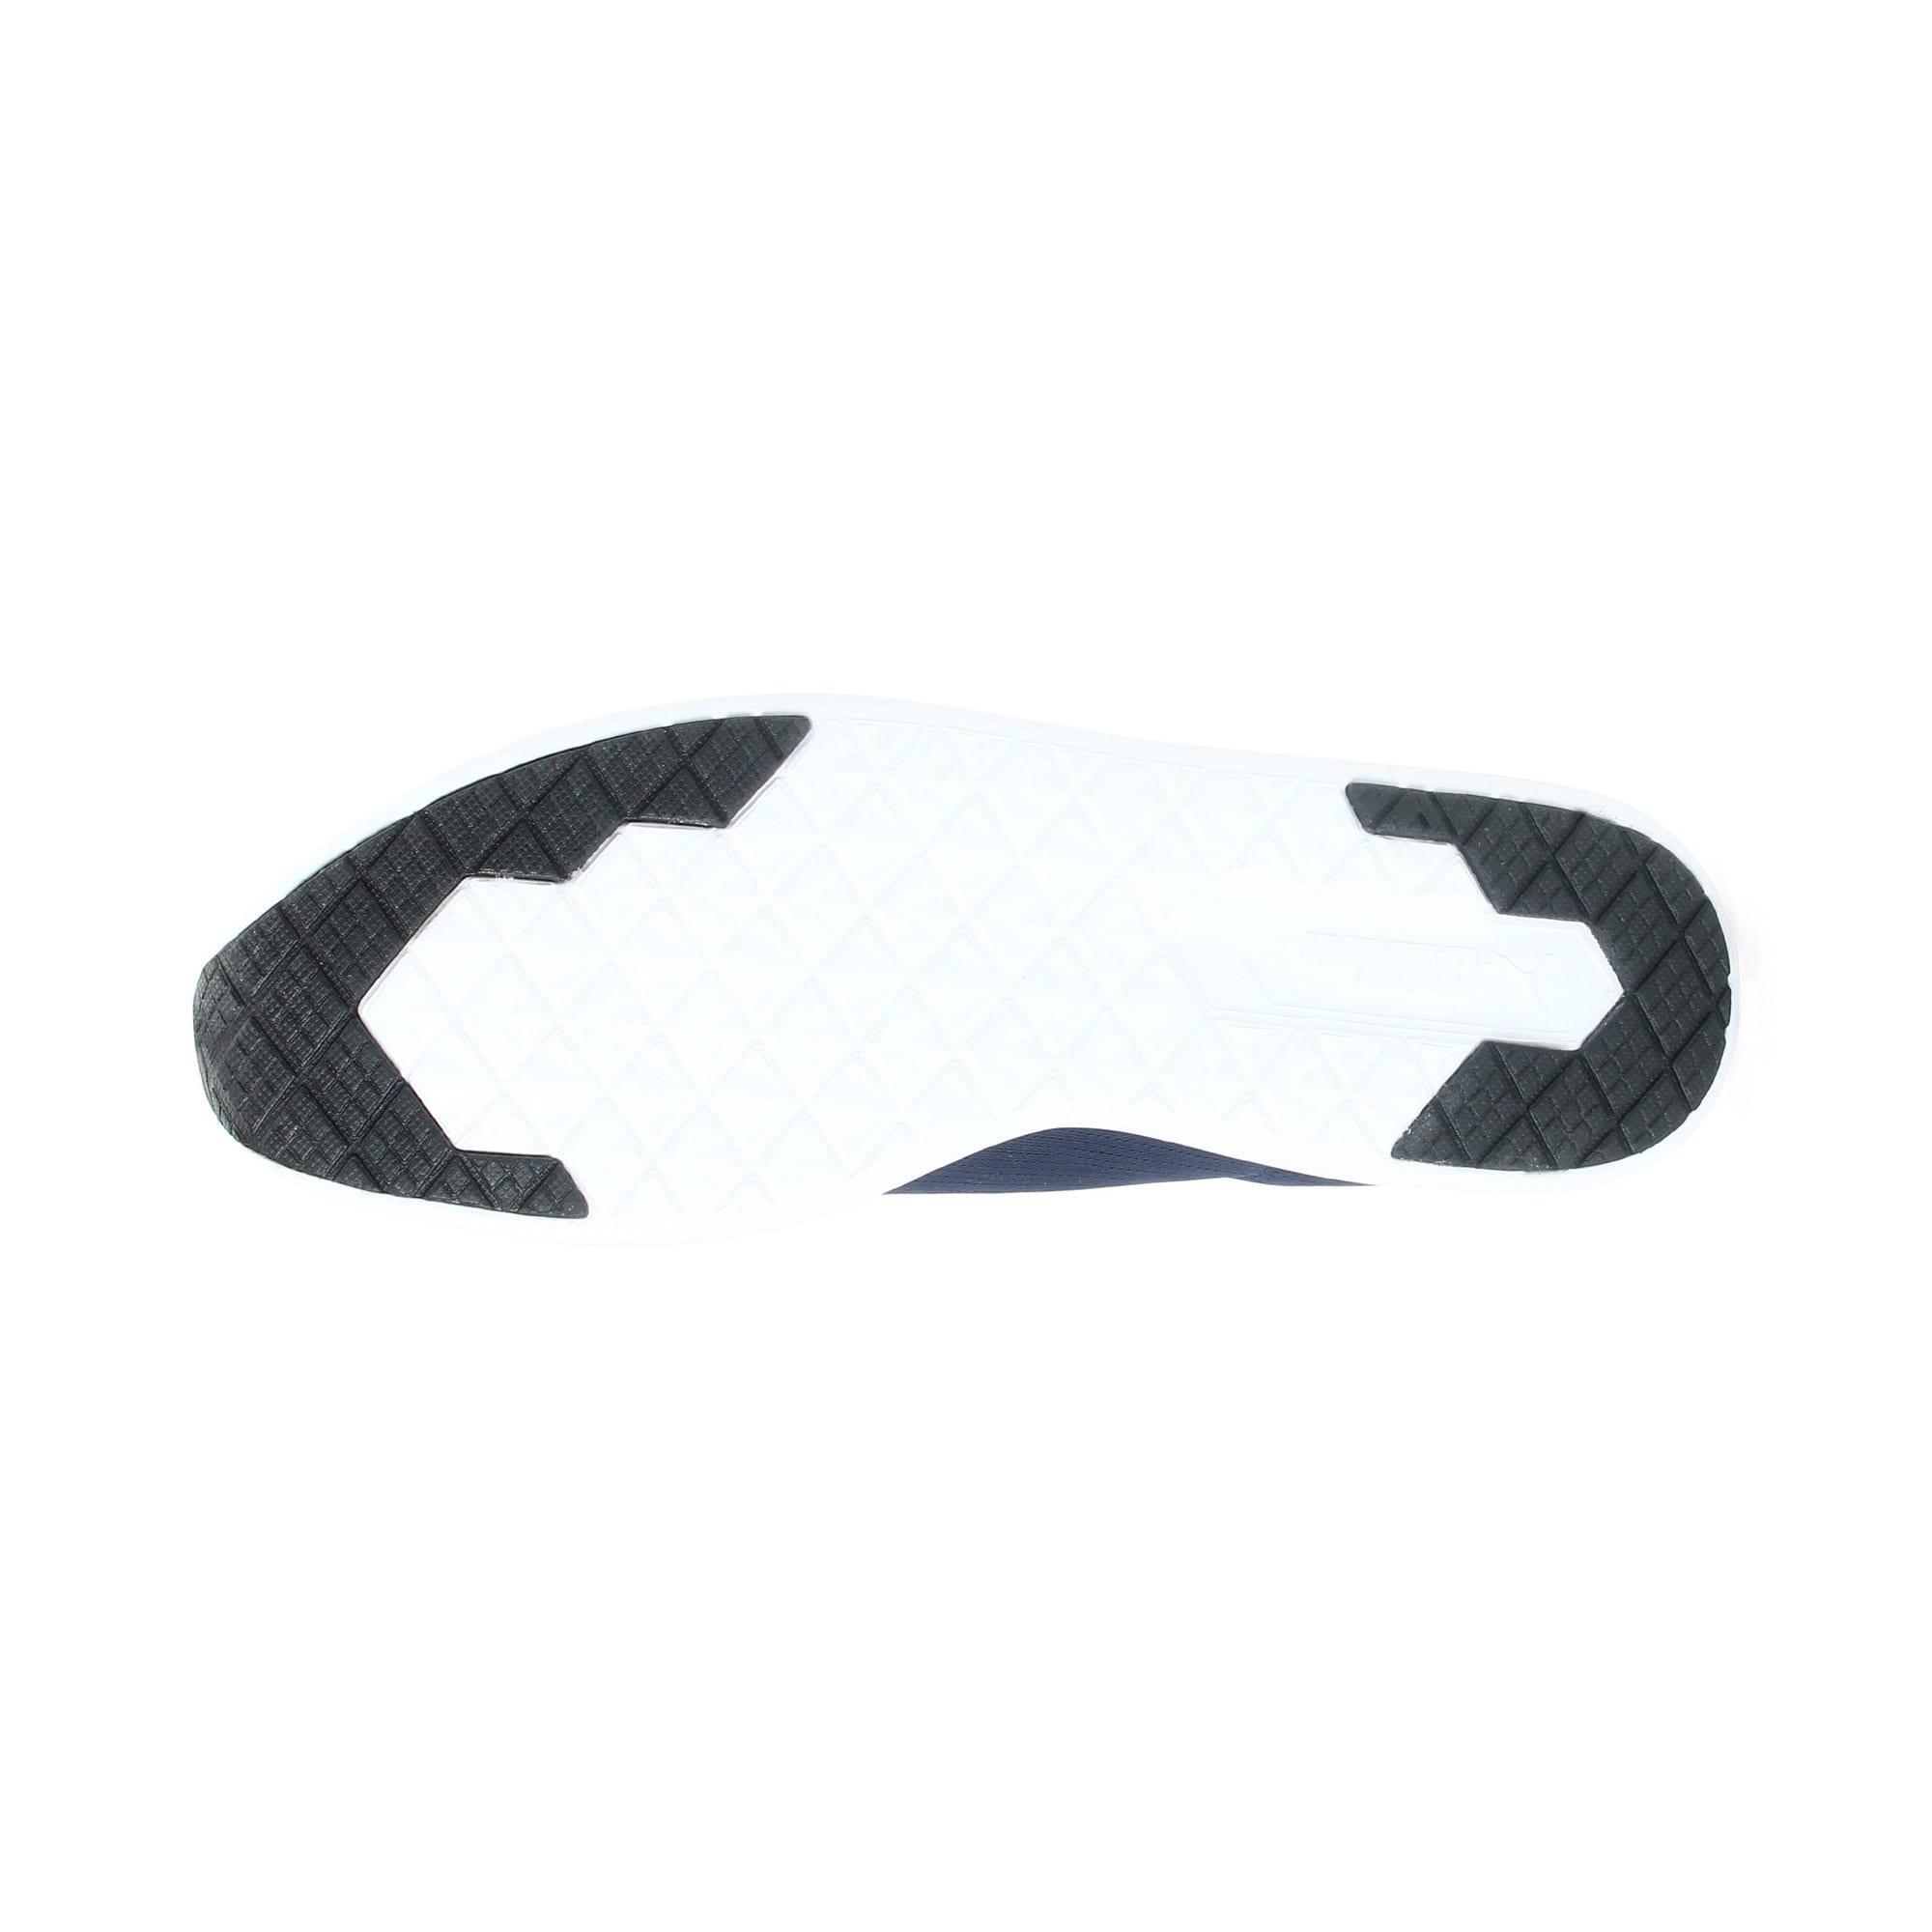 Thumbnail 4 of ST Comfort IDP Men's Sportstyle Shoes, Peacoat-Puma White, medium-IND